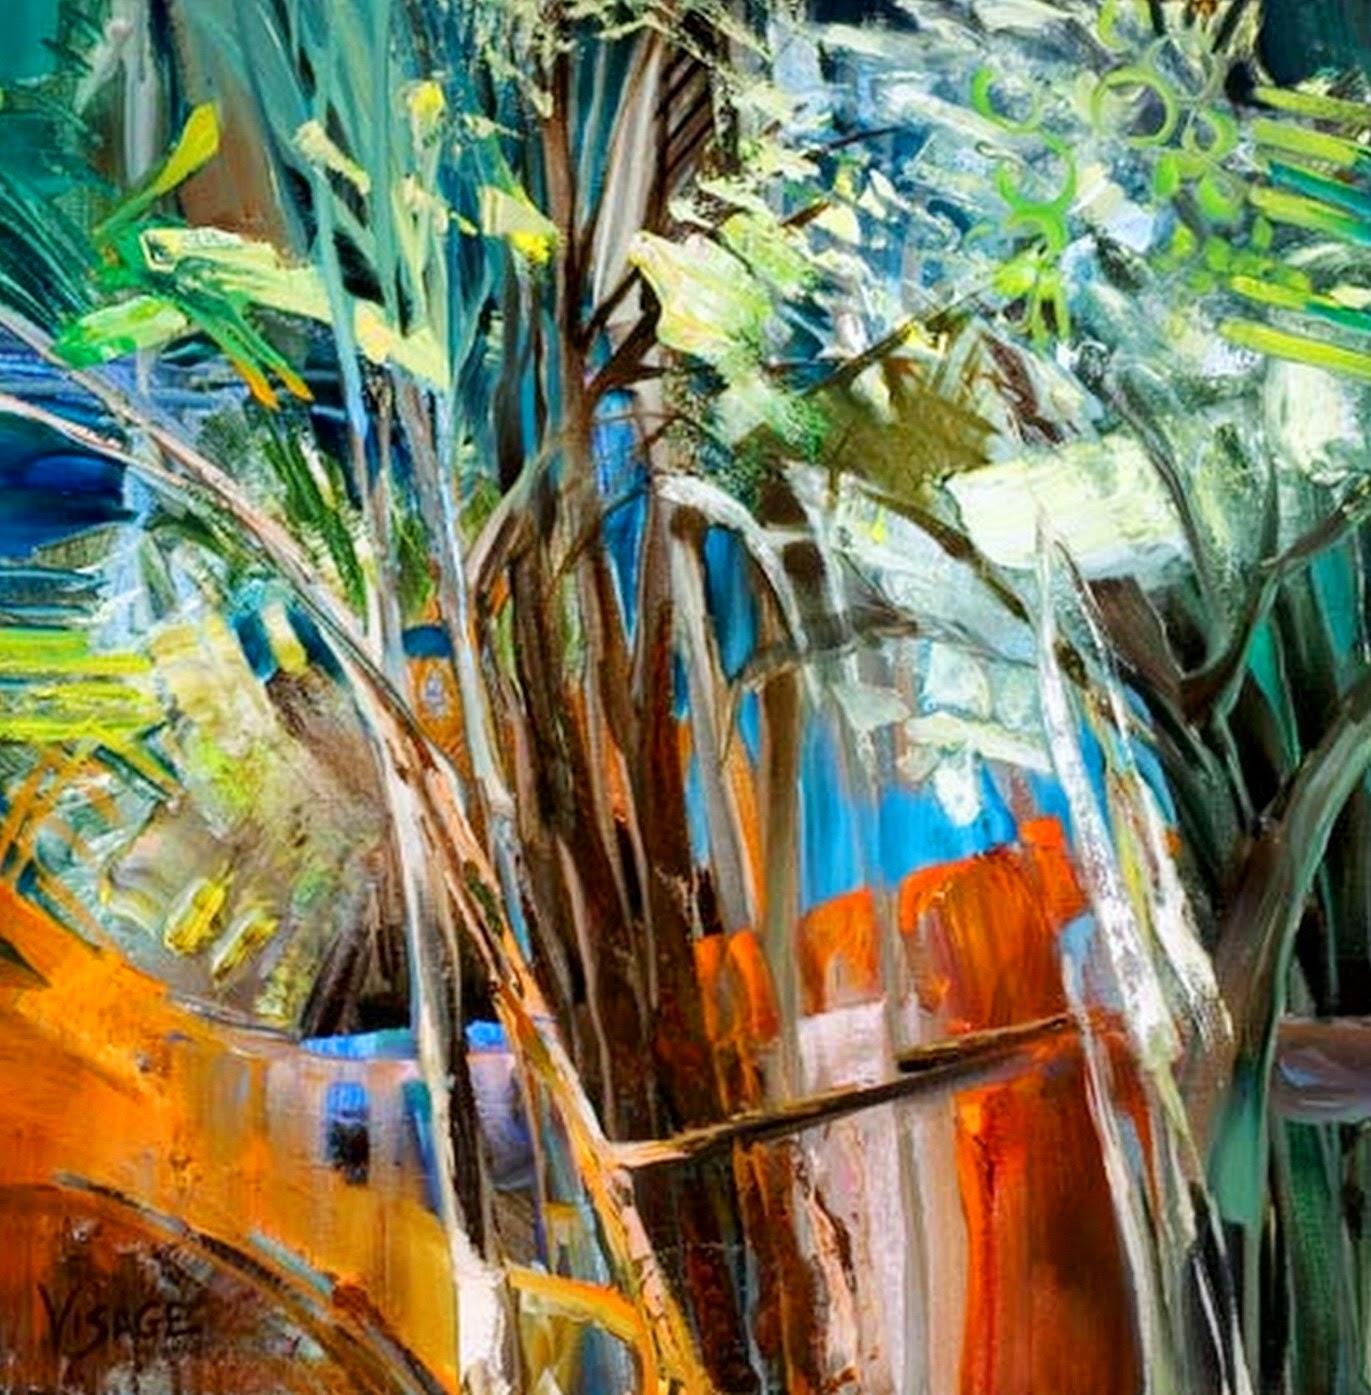 Cuadros modernos cuadros modernos pinturas al leo for Cuadros al oleo modernos